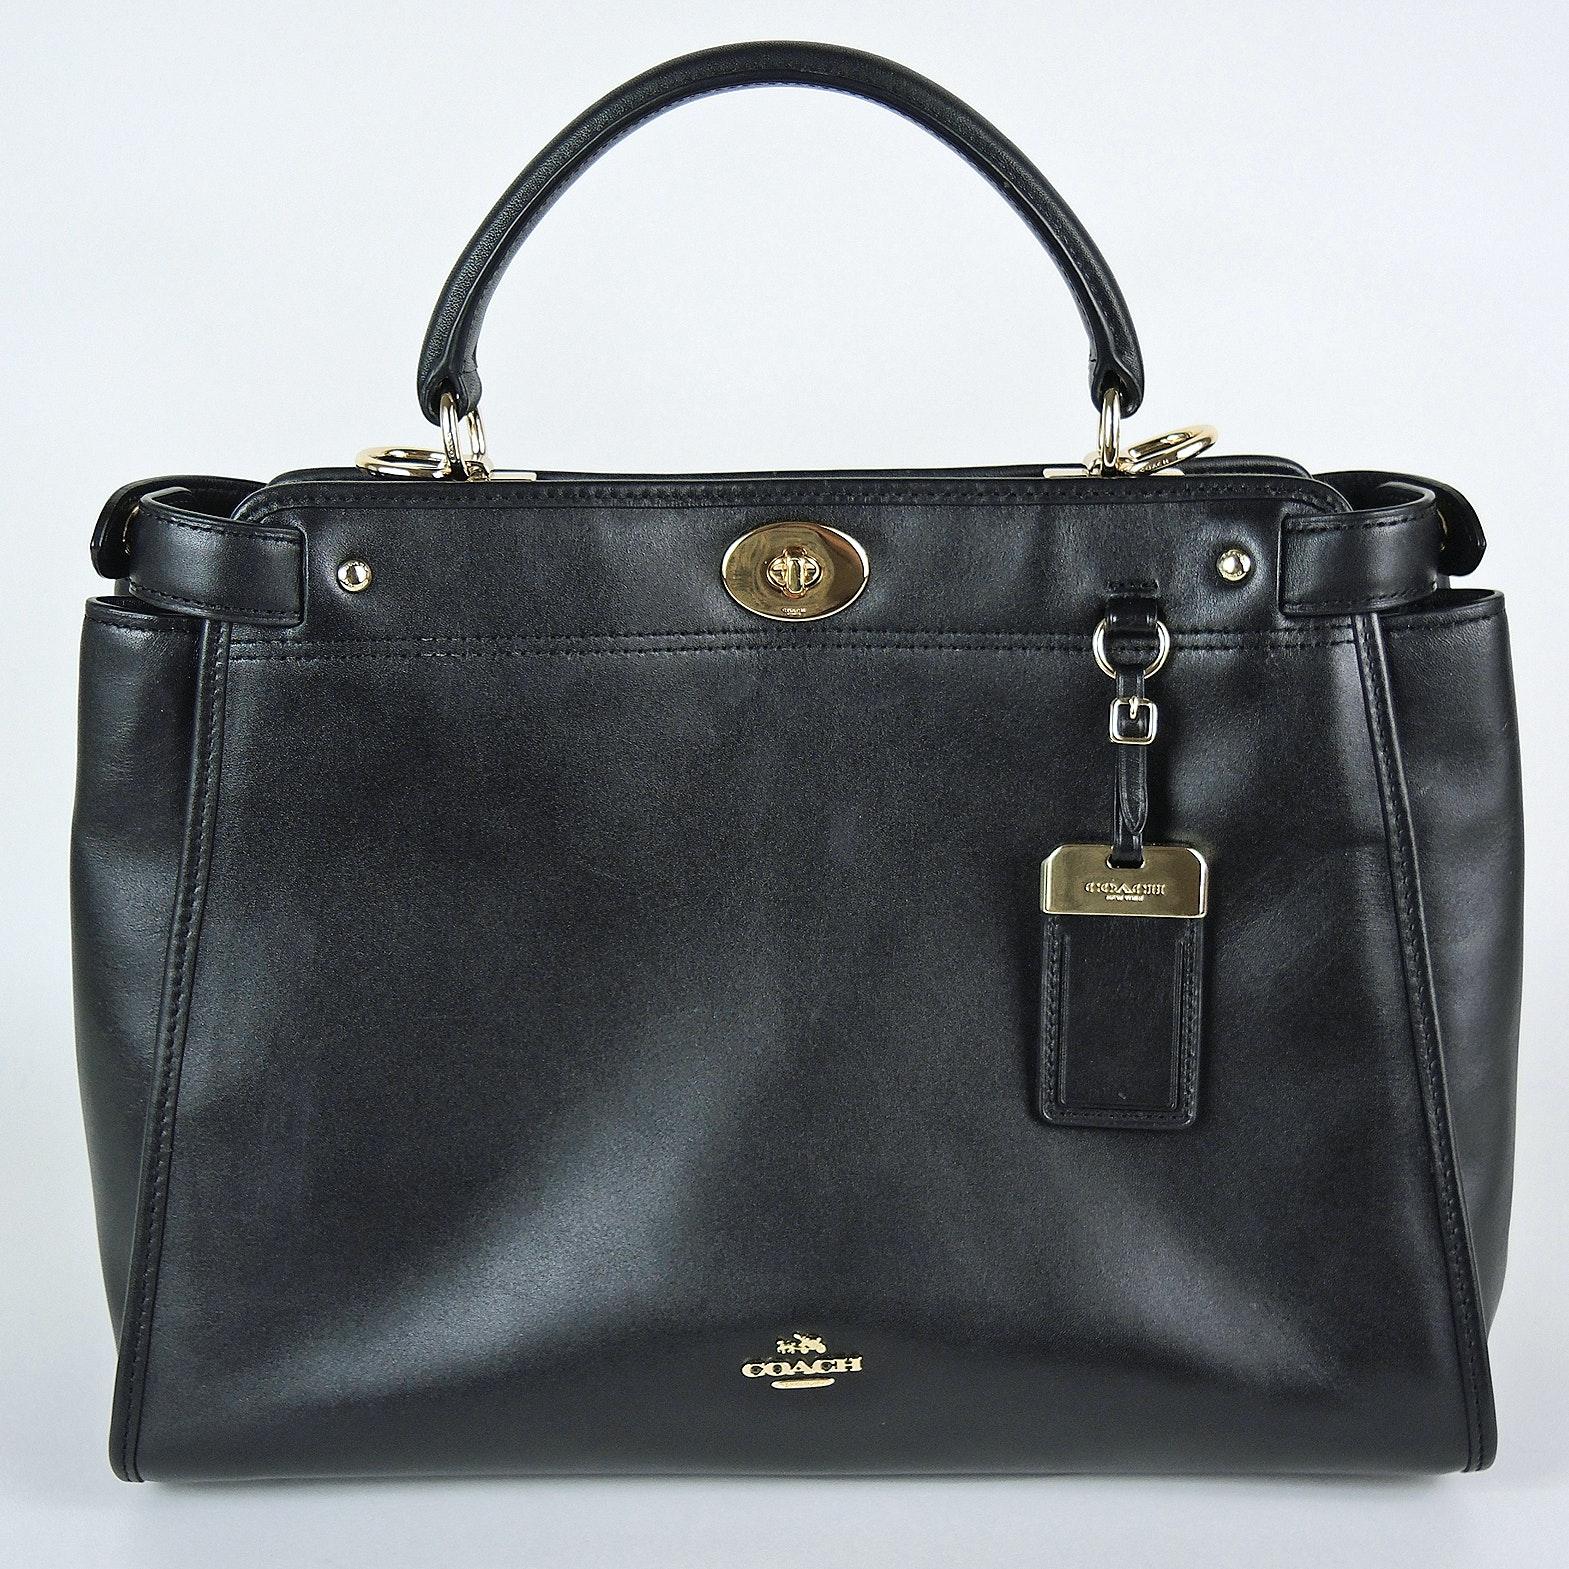 Coach Gramercy Black Leather Satchel with Box